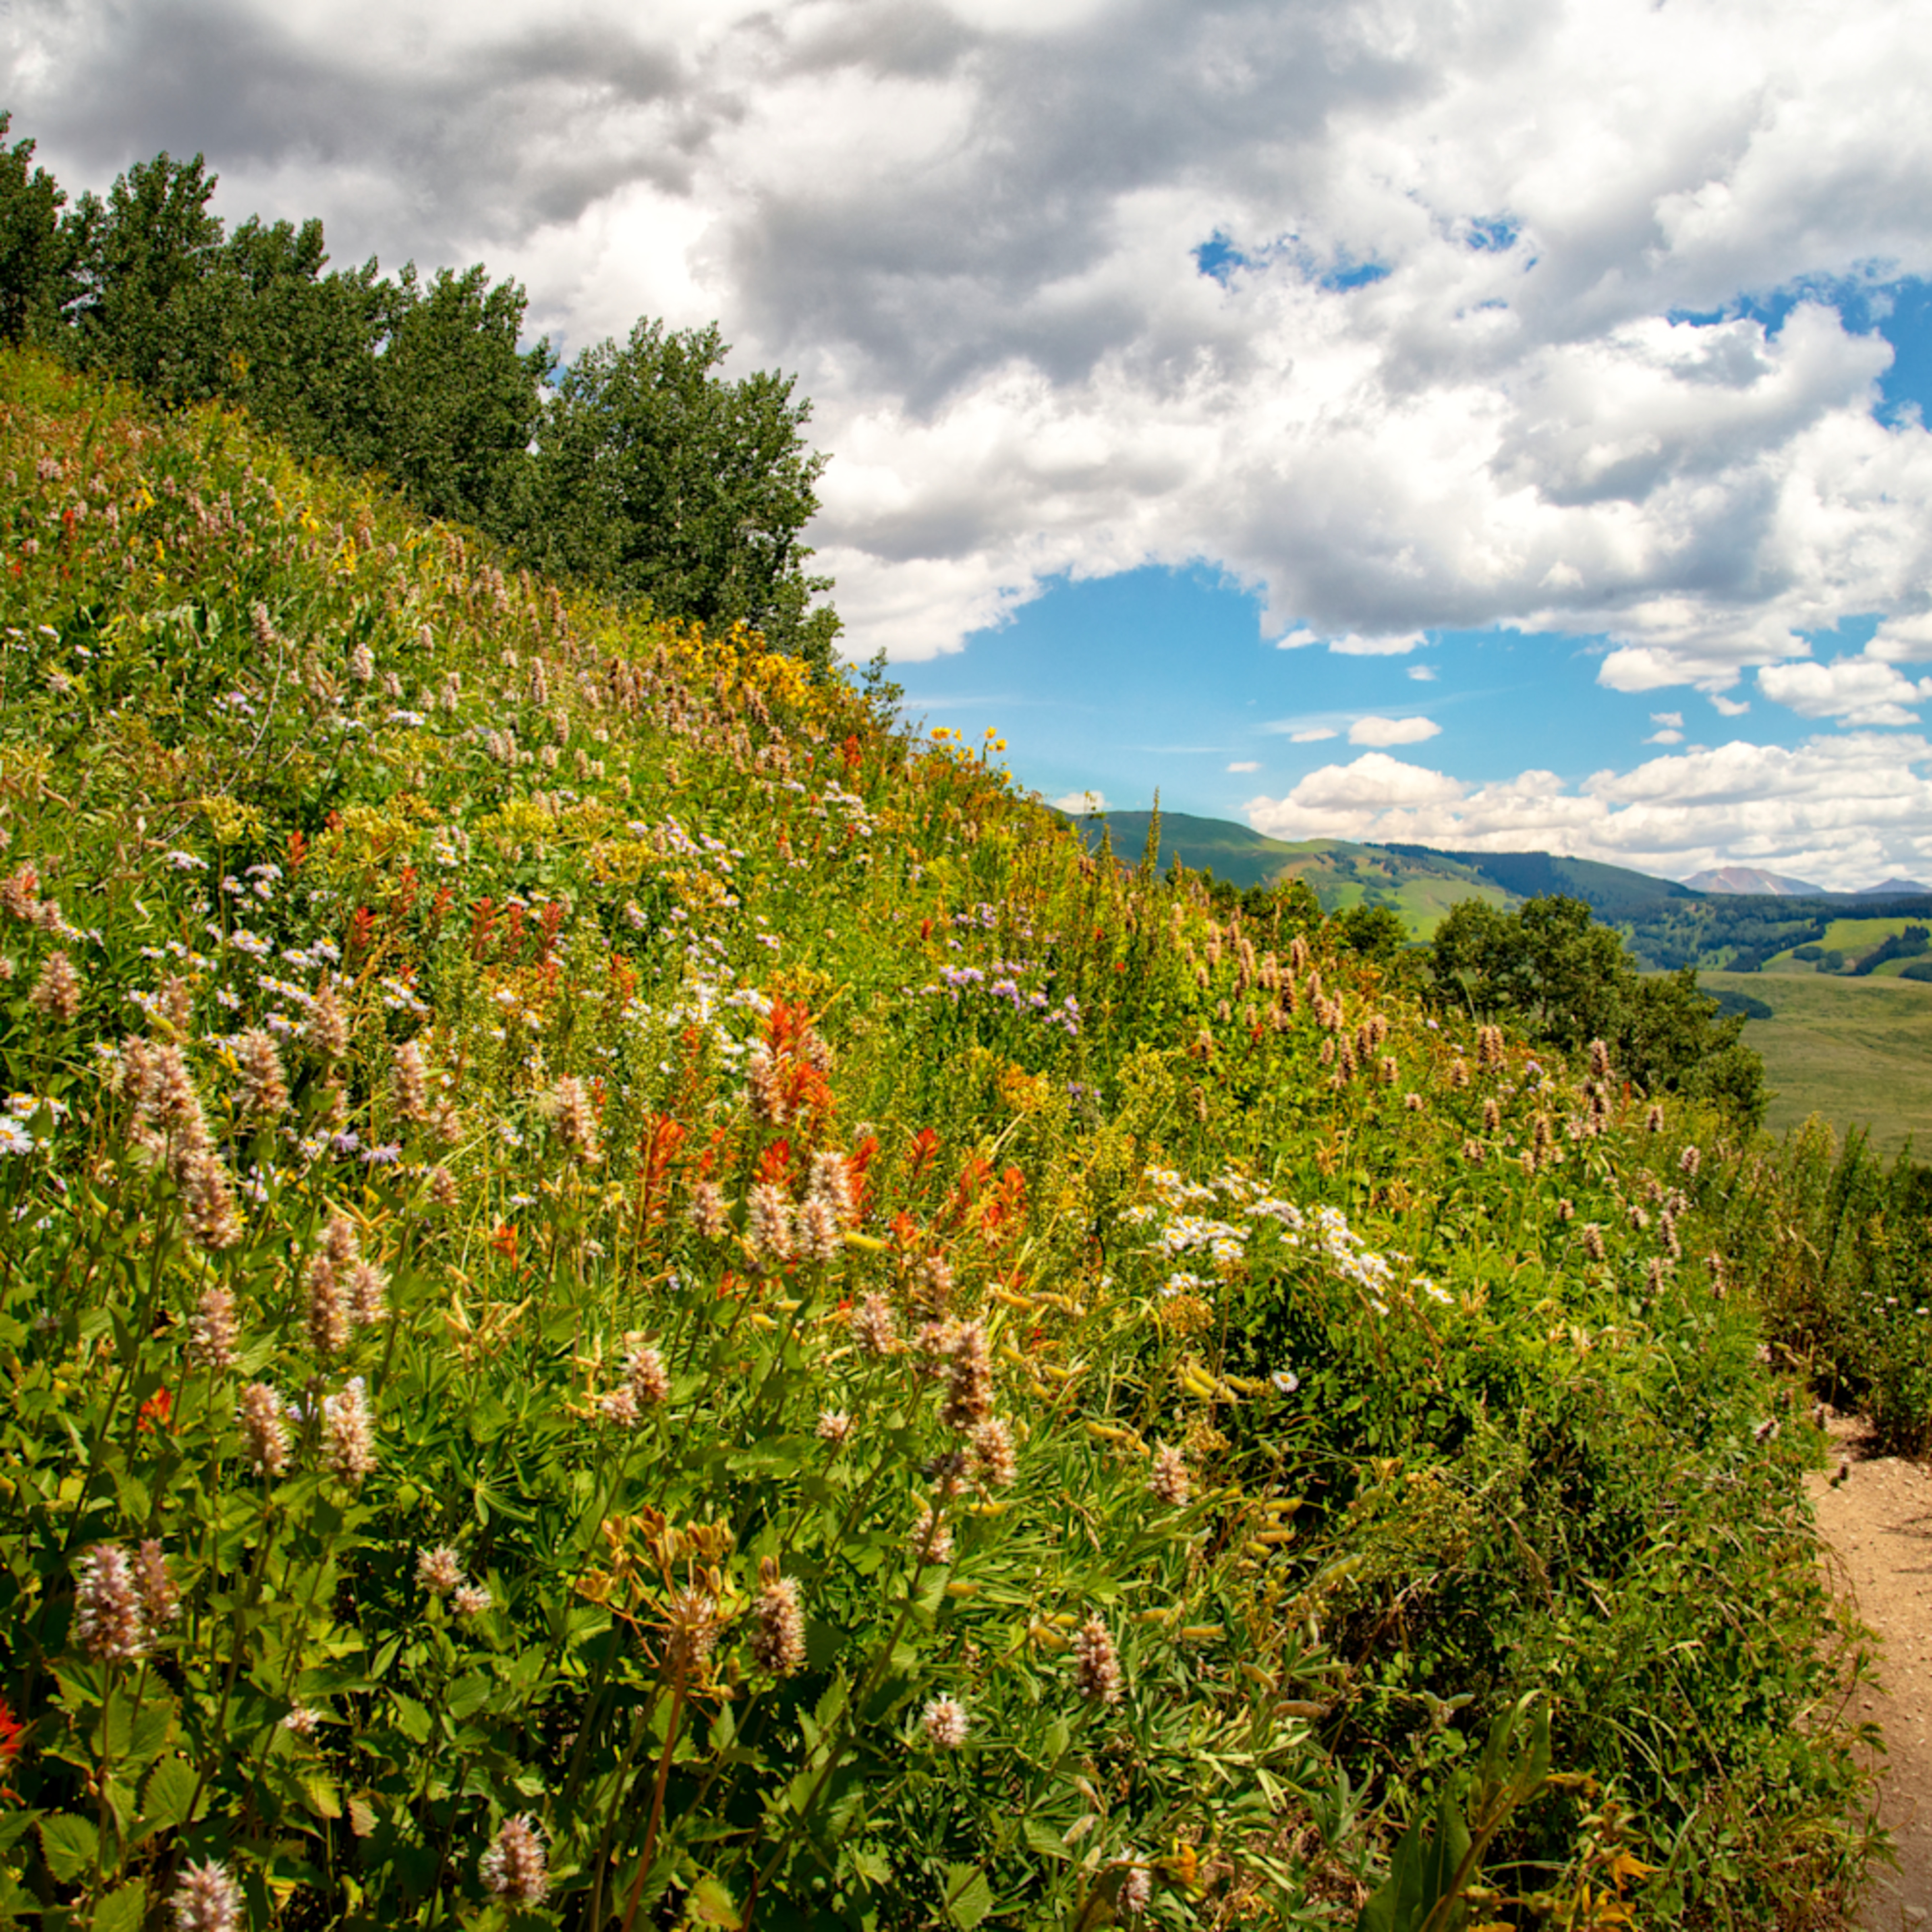 Snodgrass trail wildflowers mountains 7061 gfs c8xoba